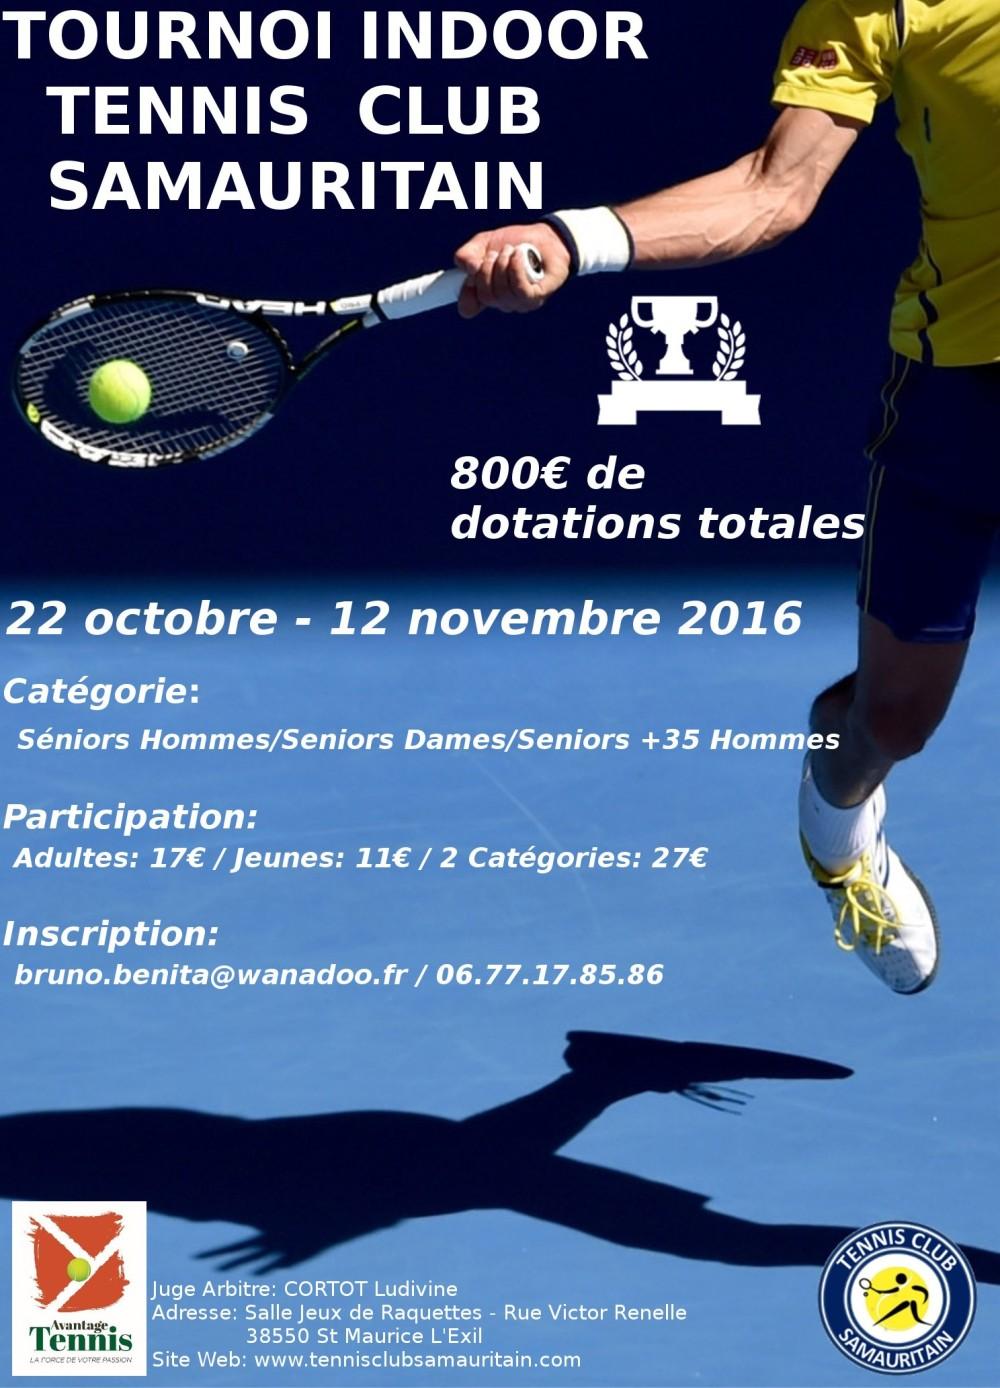 affiche_tournoi_tennis_definitif_v2_sans_date